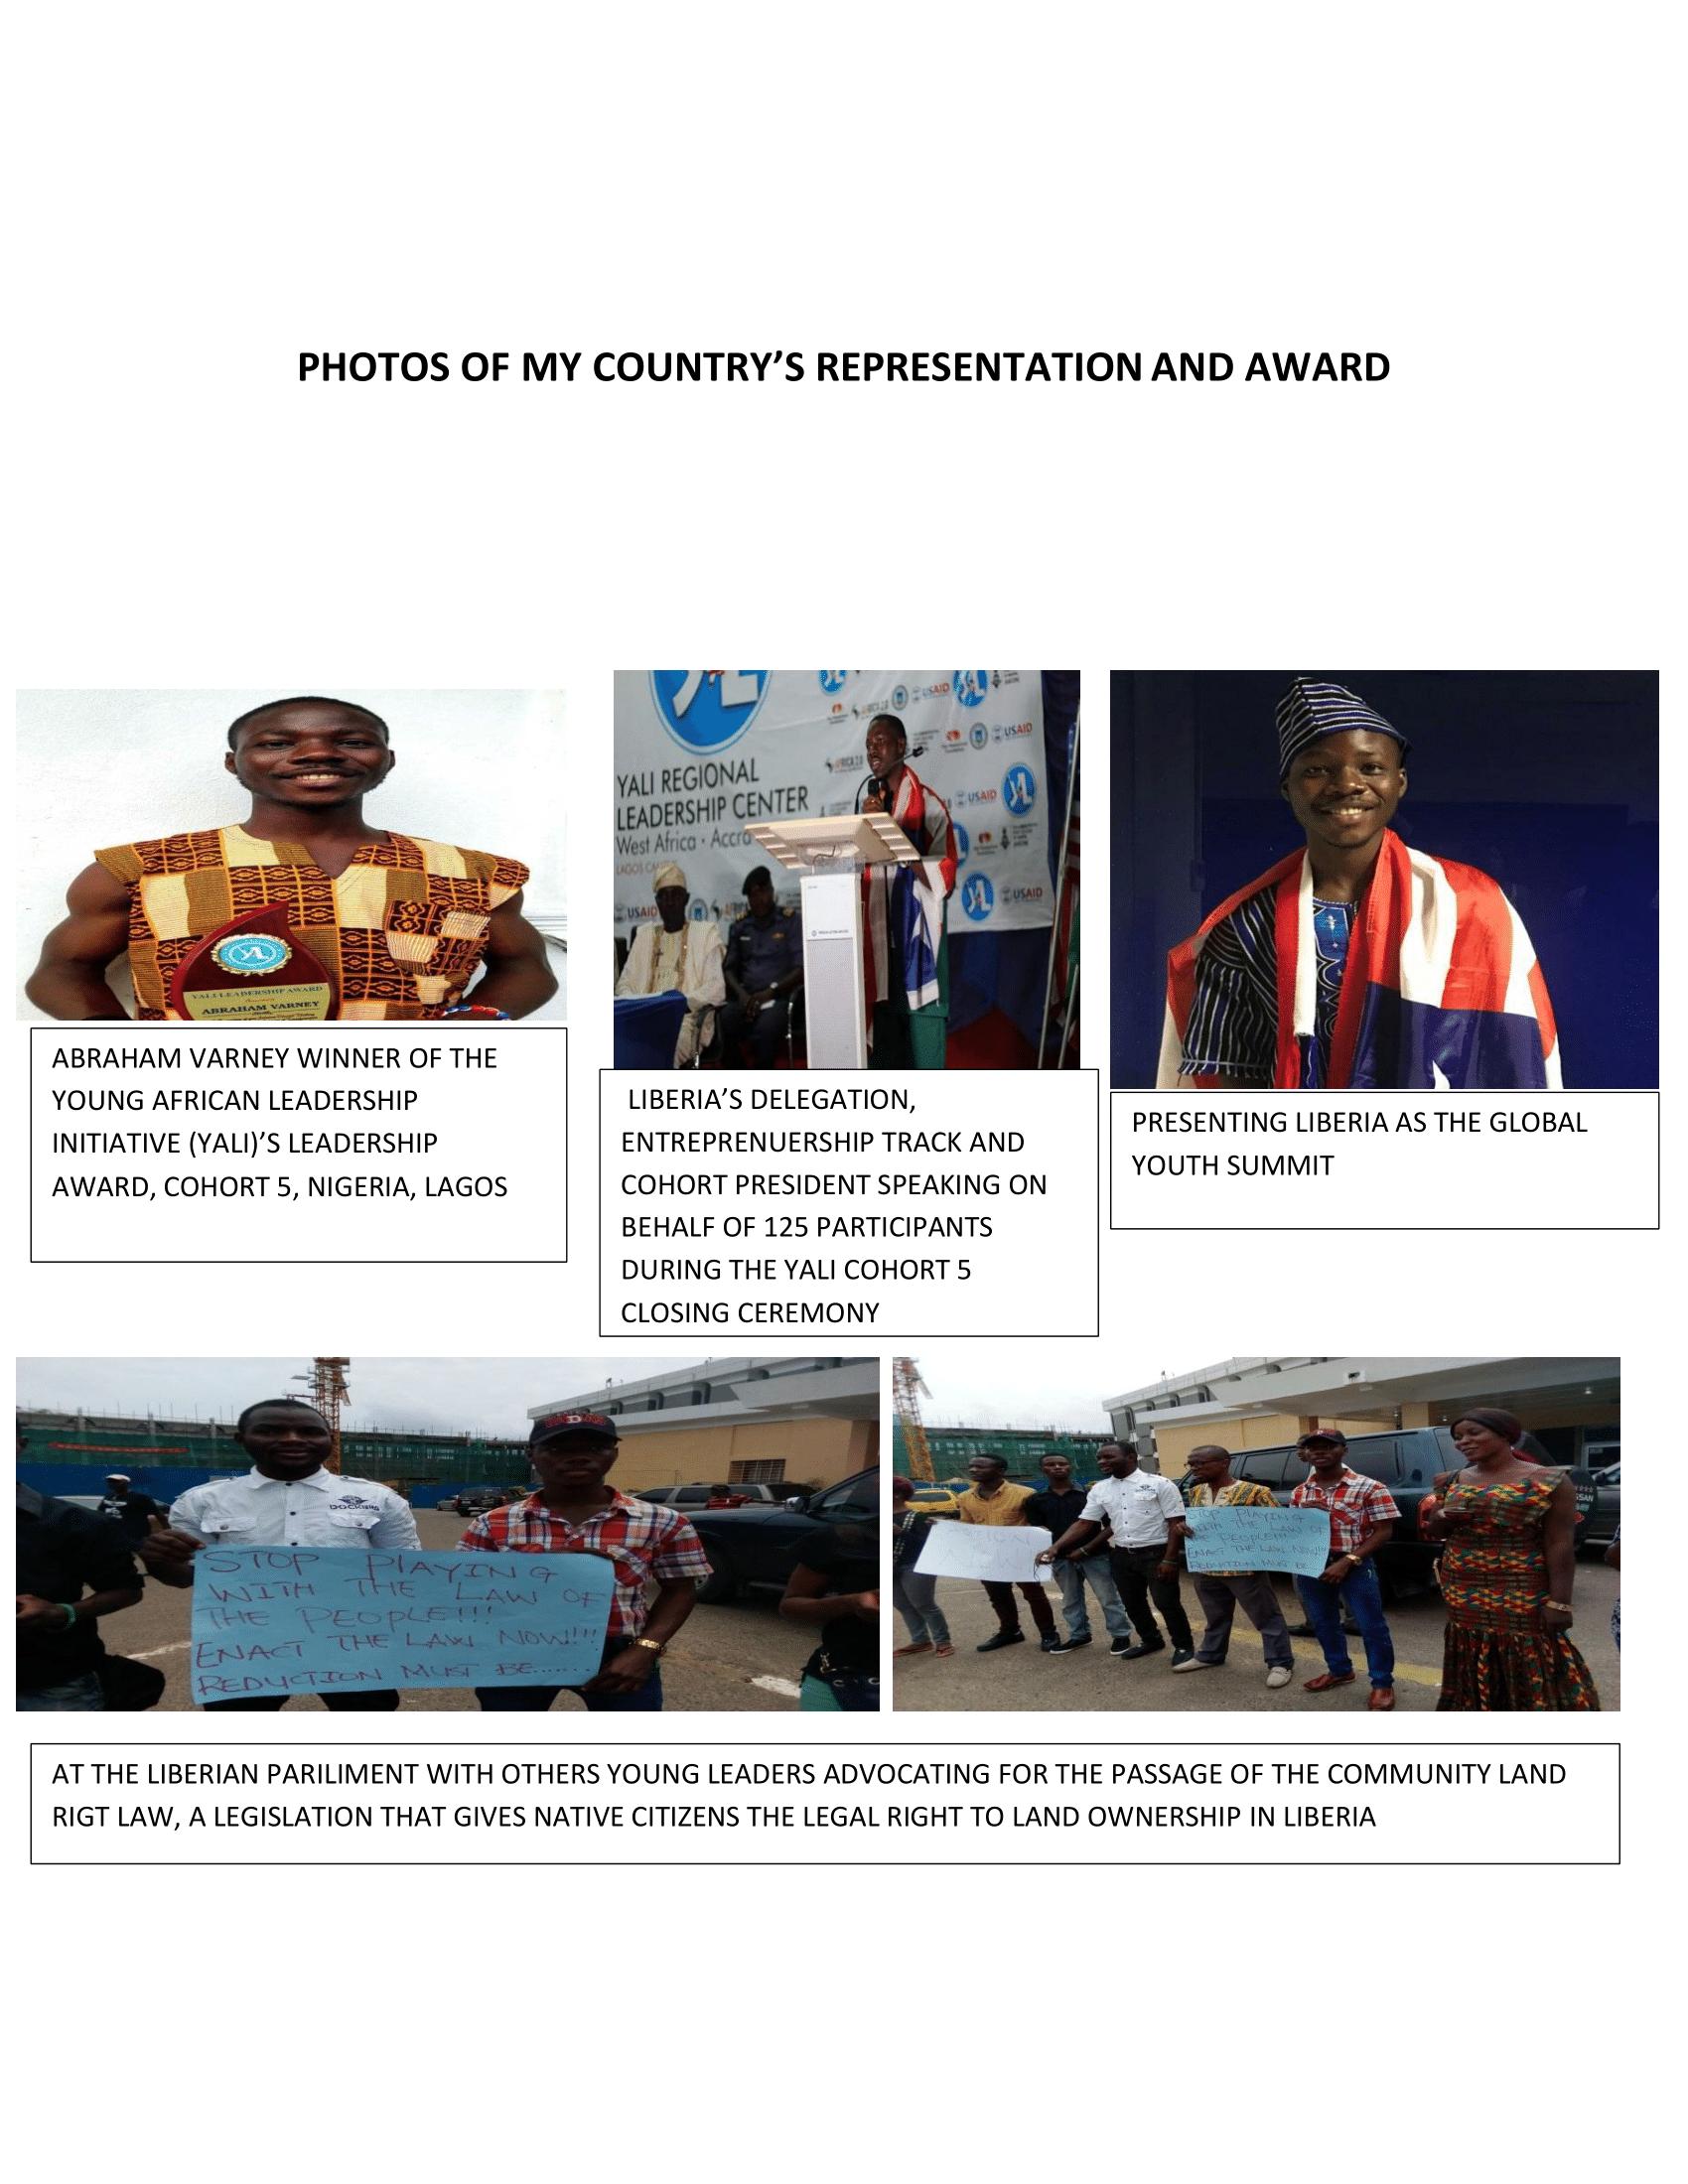 Abraham-Varney-PHOTOS OF INTERNATIONAL REPRESENTATION-in-Liberia - Abraham Varney-1.png